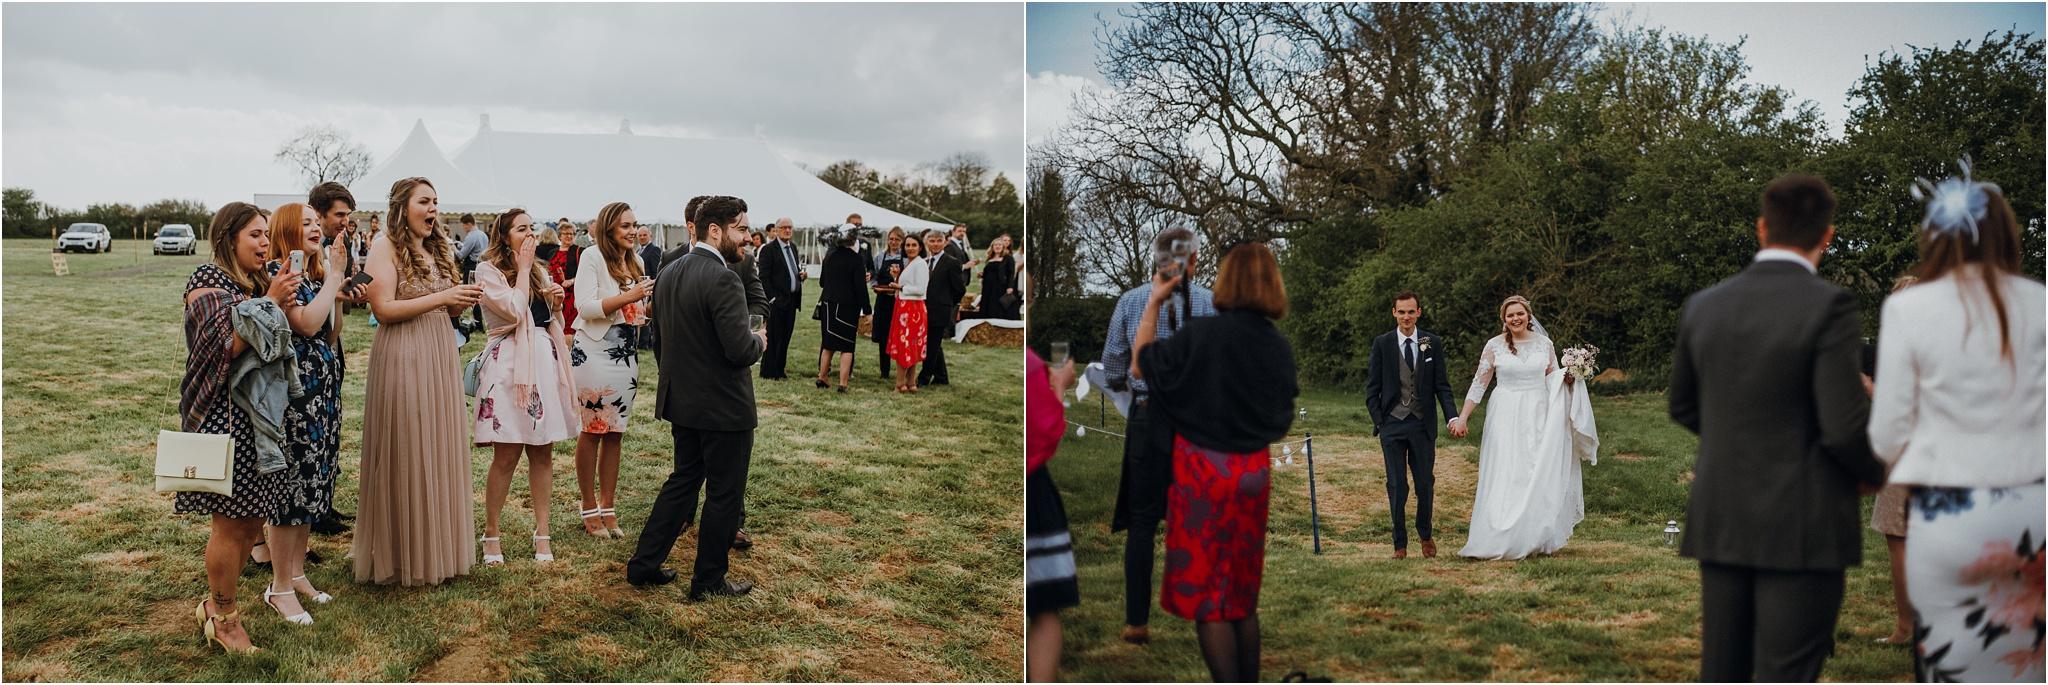 Outdoor-country-wedding-Edinburgh-photographer__0093.jpg